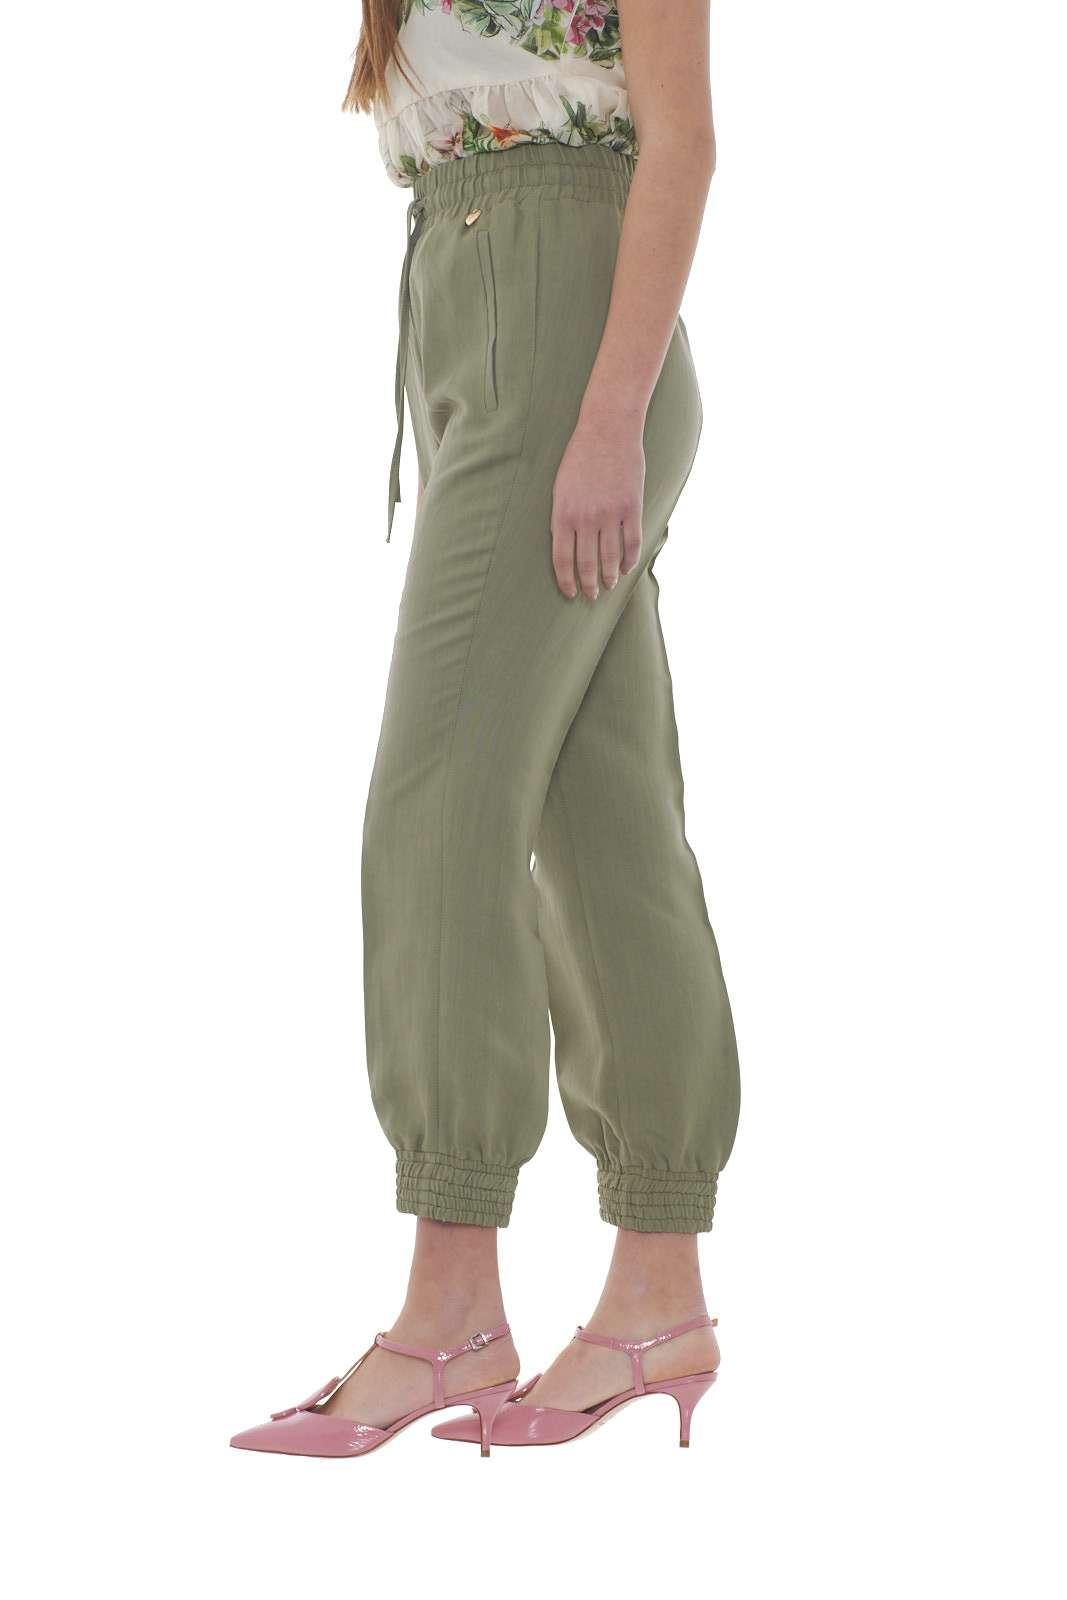 https://www.parmax.com/media/catalog/product/a/i/PE-outlet_parmax-pantaloni-donna-Twin-Set-201TT2215-B.jpg